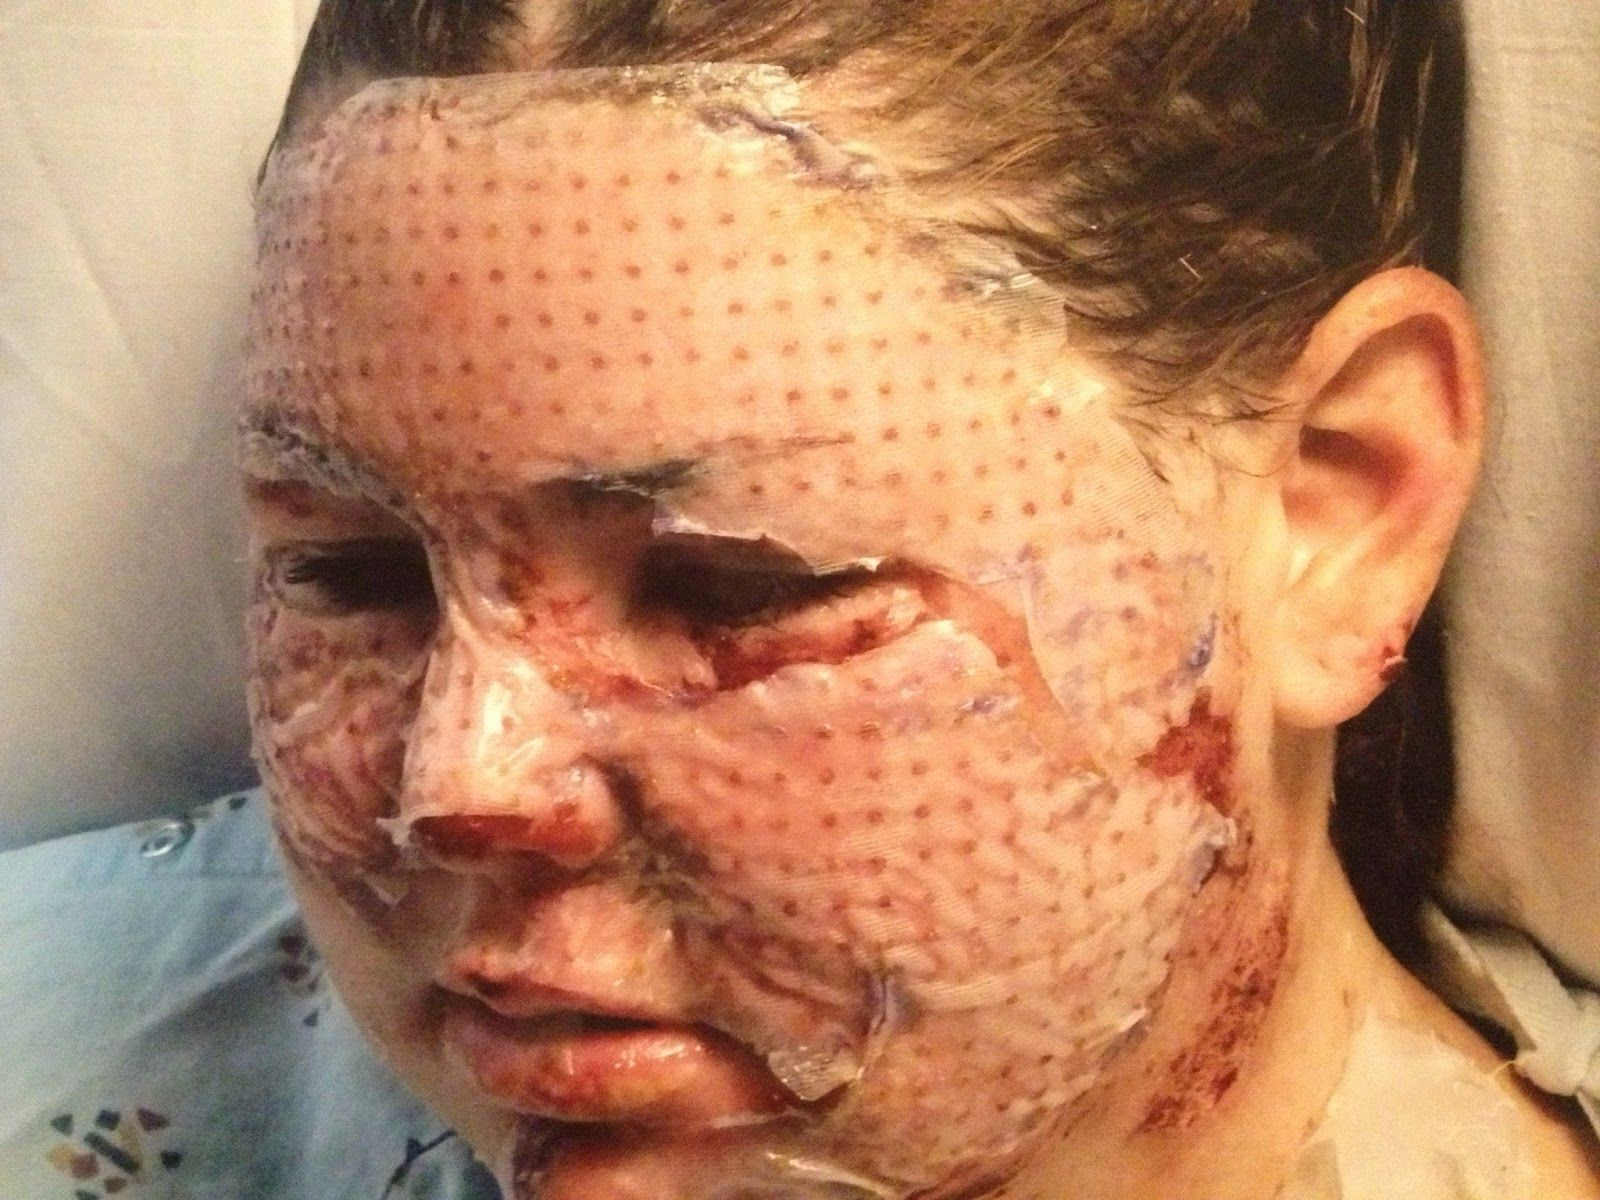 Facial skin grafting surgery